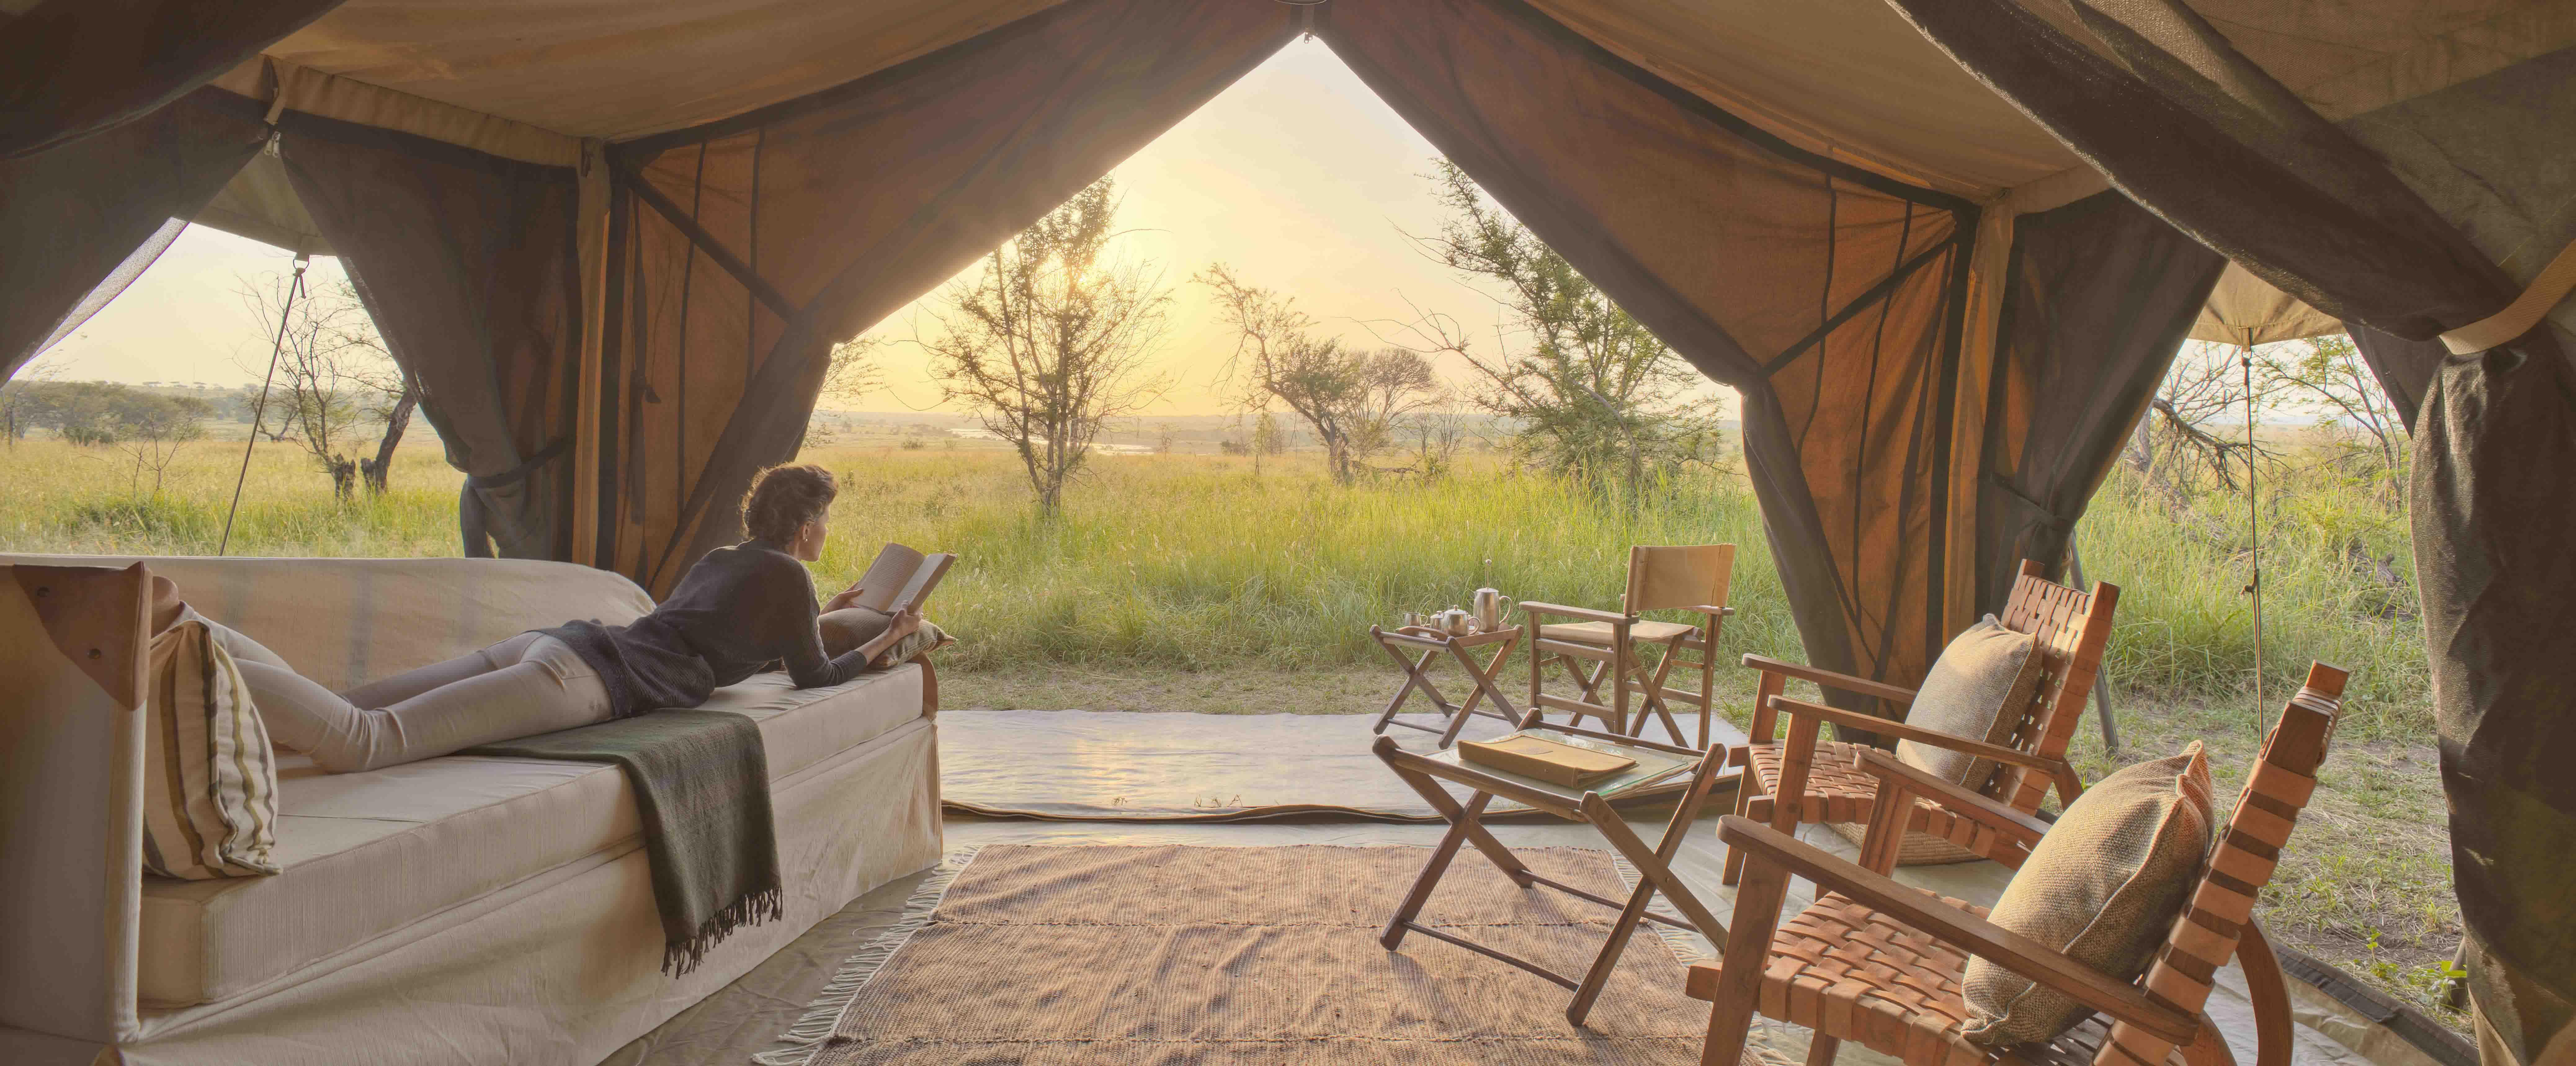 serengeti_rubondo_insel_im_lake_victoria_luxus_safari